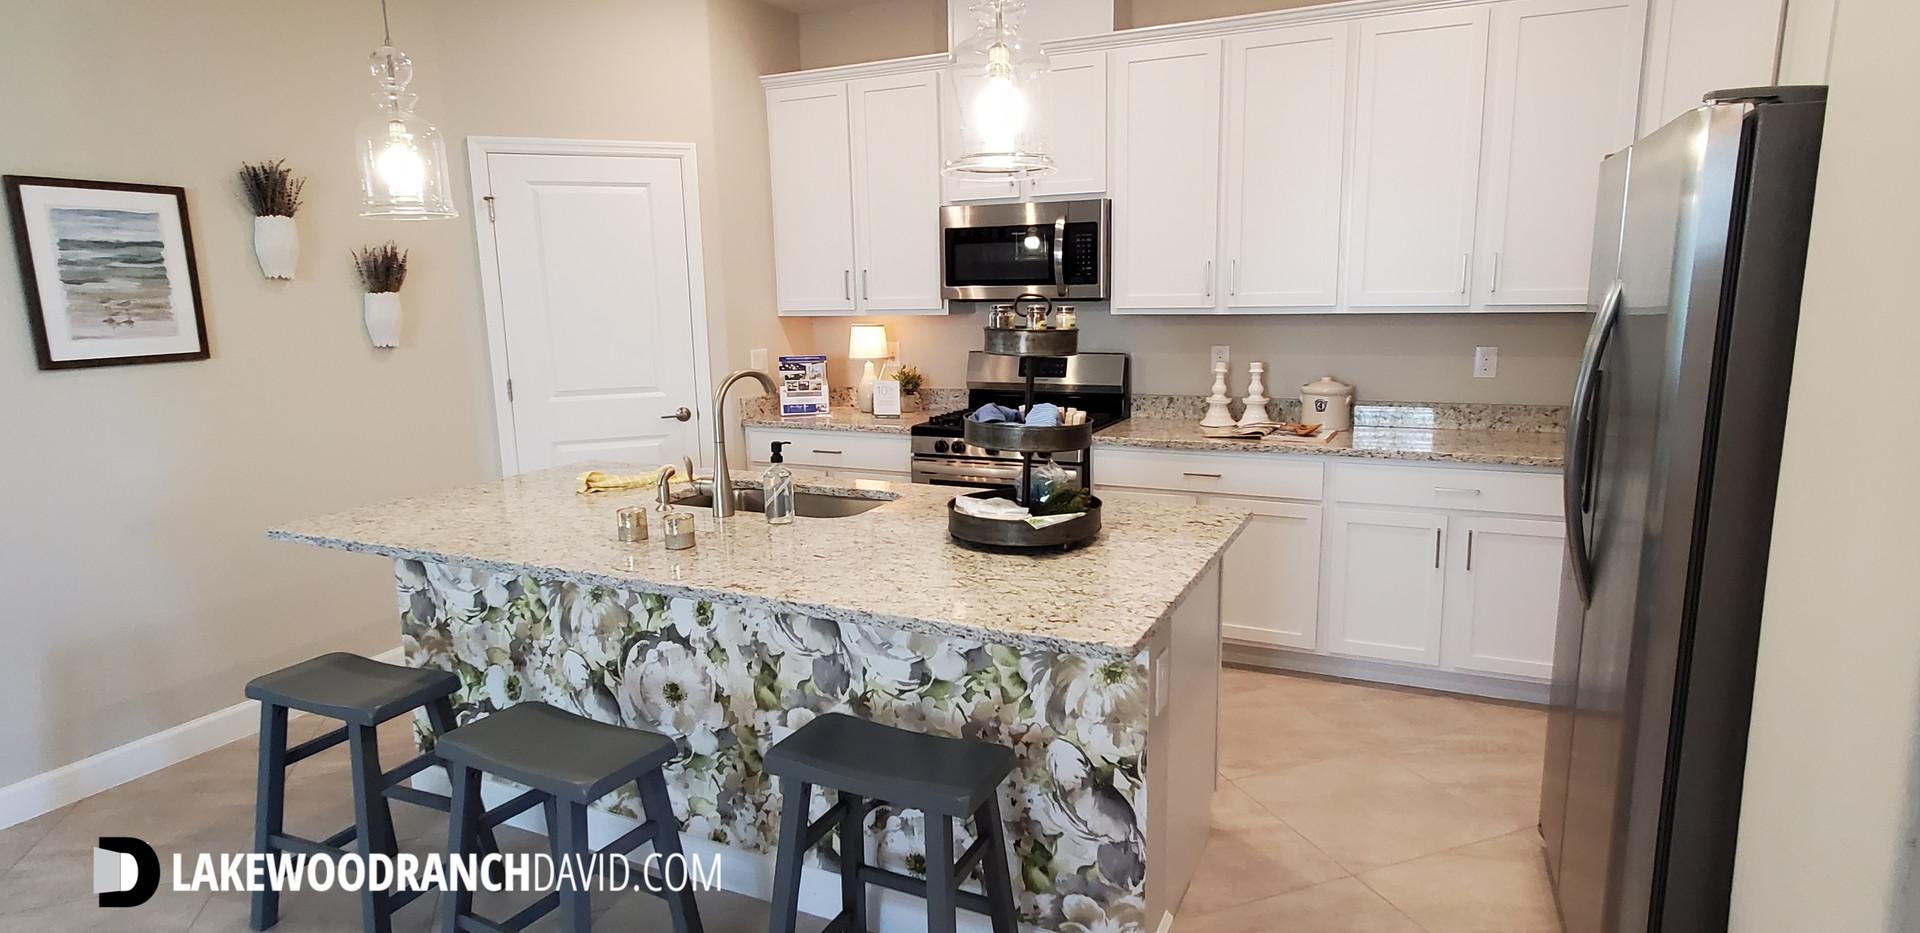 Lorraine Lakes Lakewood Ranch Trevi model home kitchen